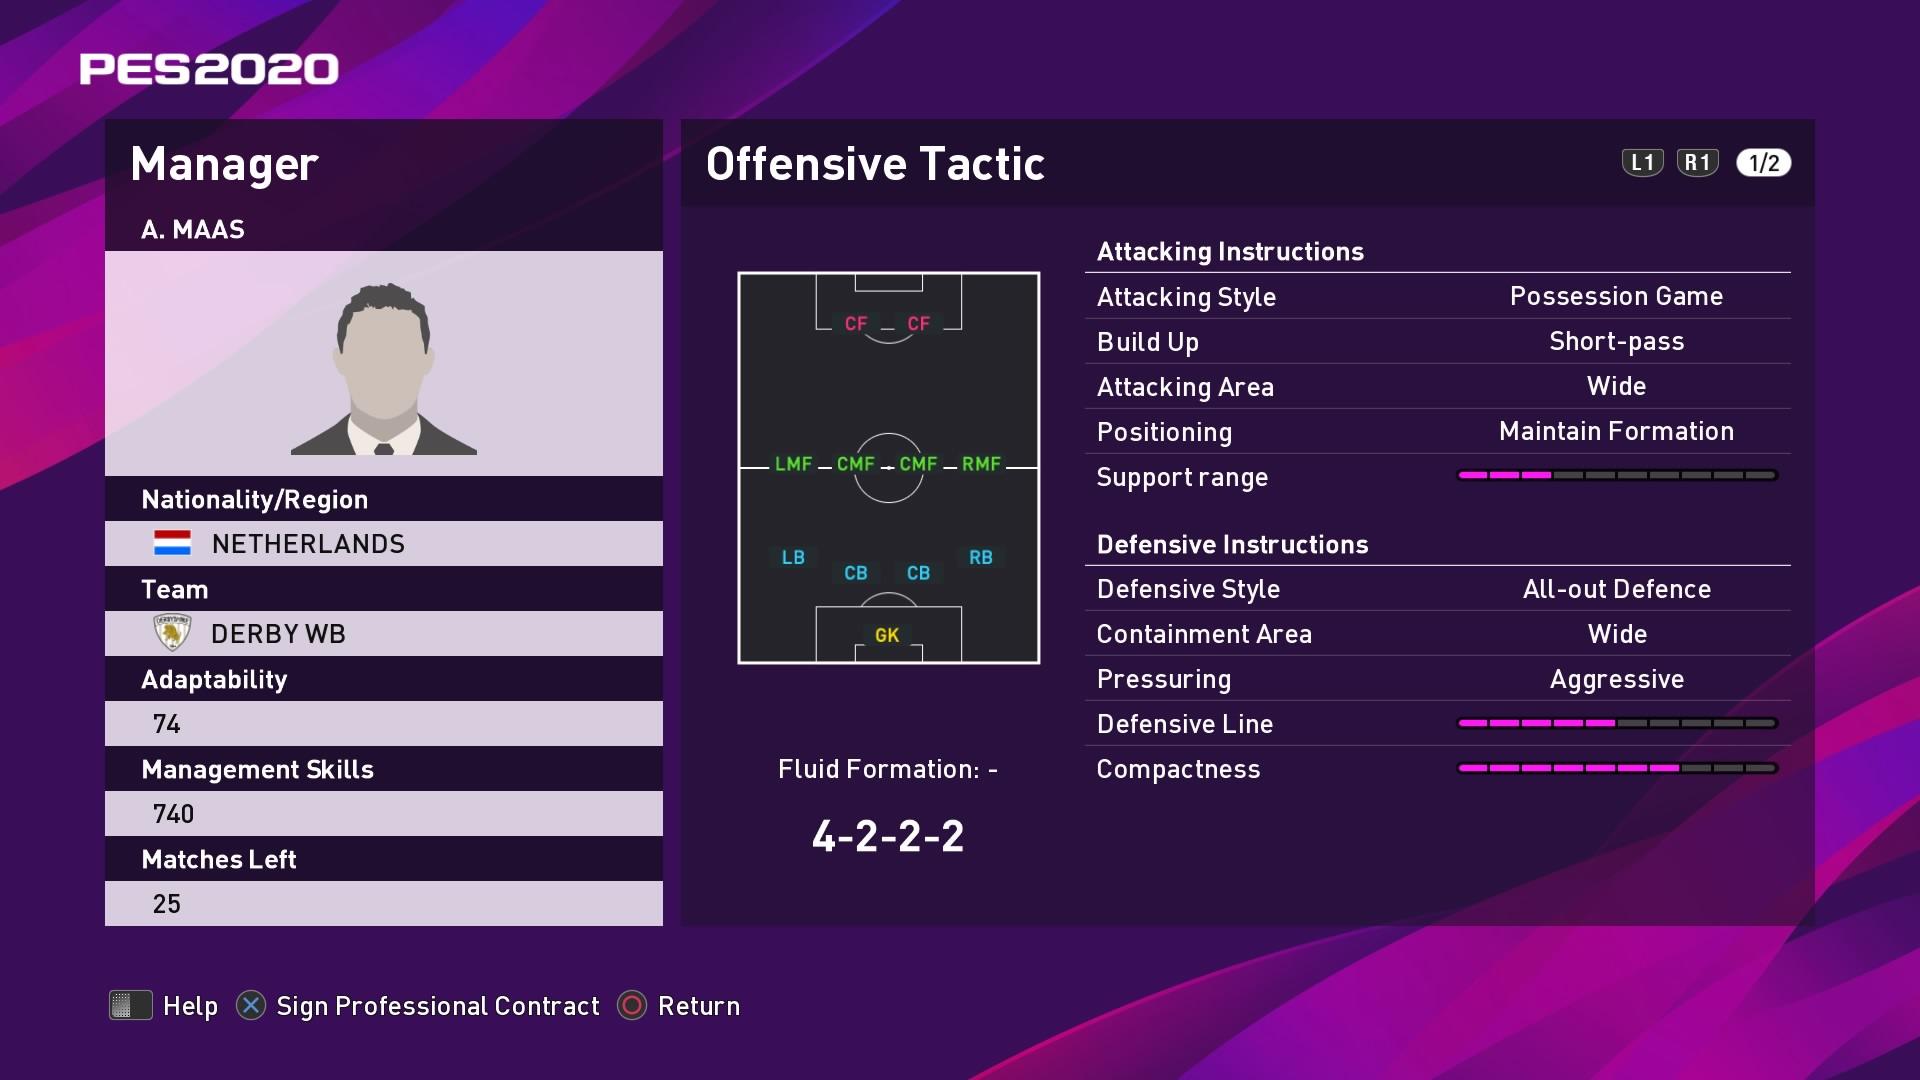 A. Maas (Phillip Cocu) Offensive Tactic in PES 2020 myClub